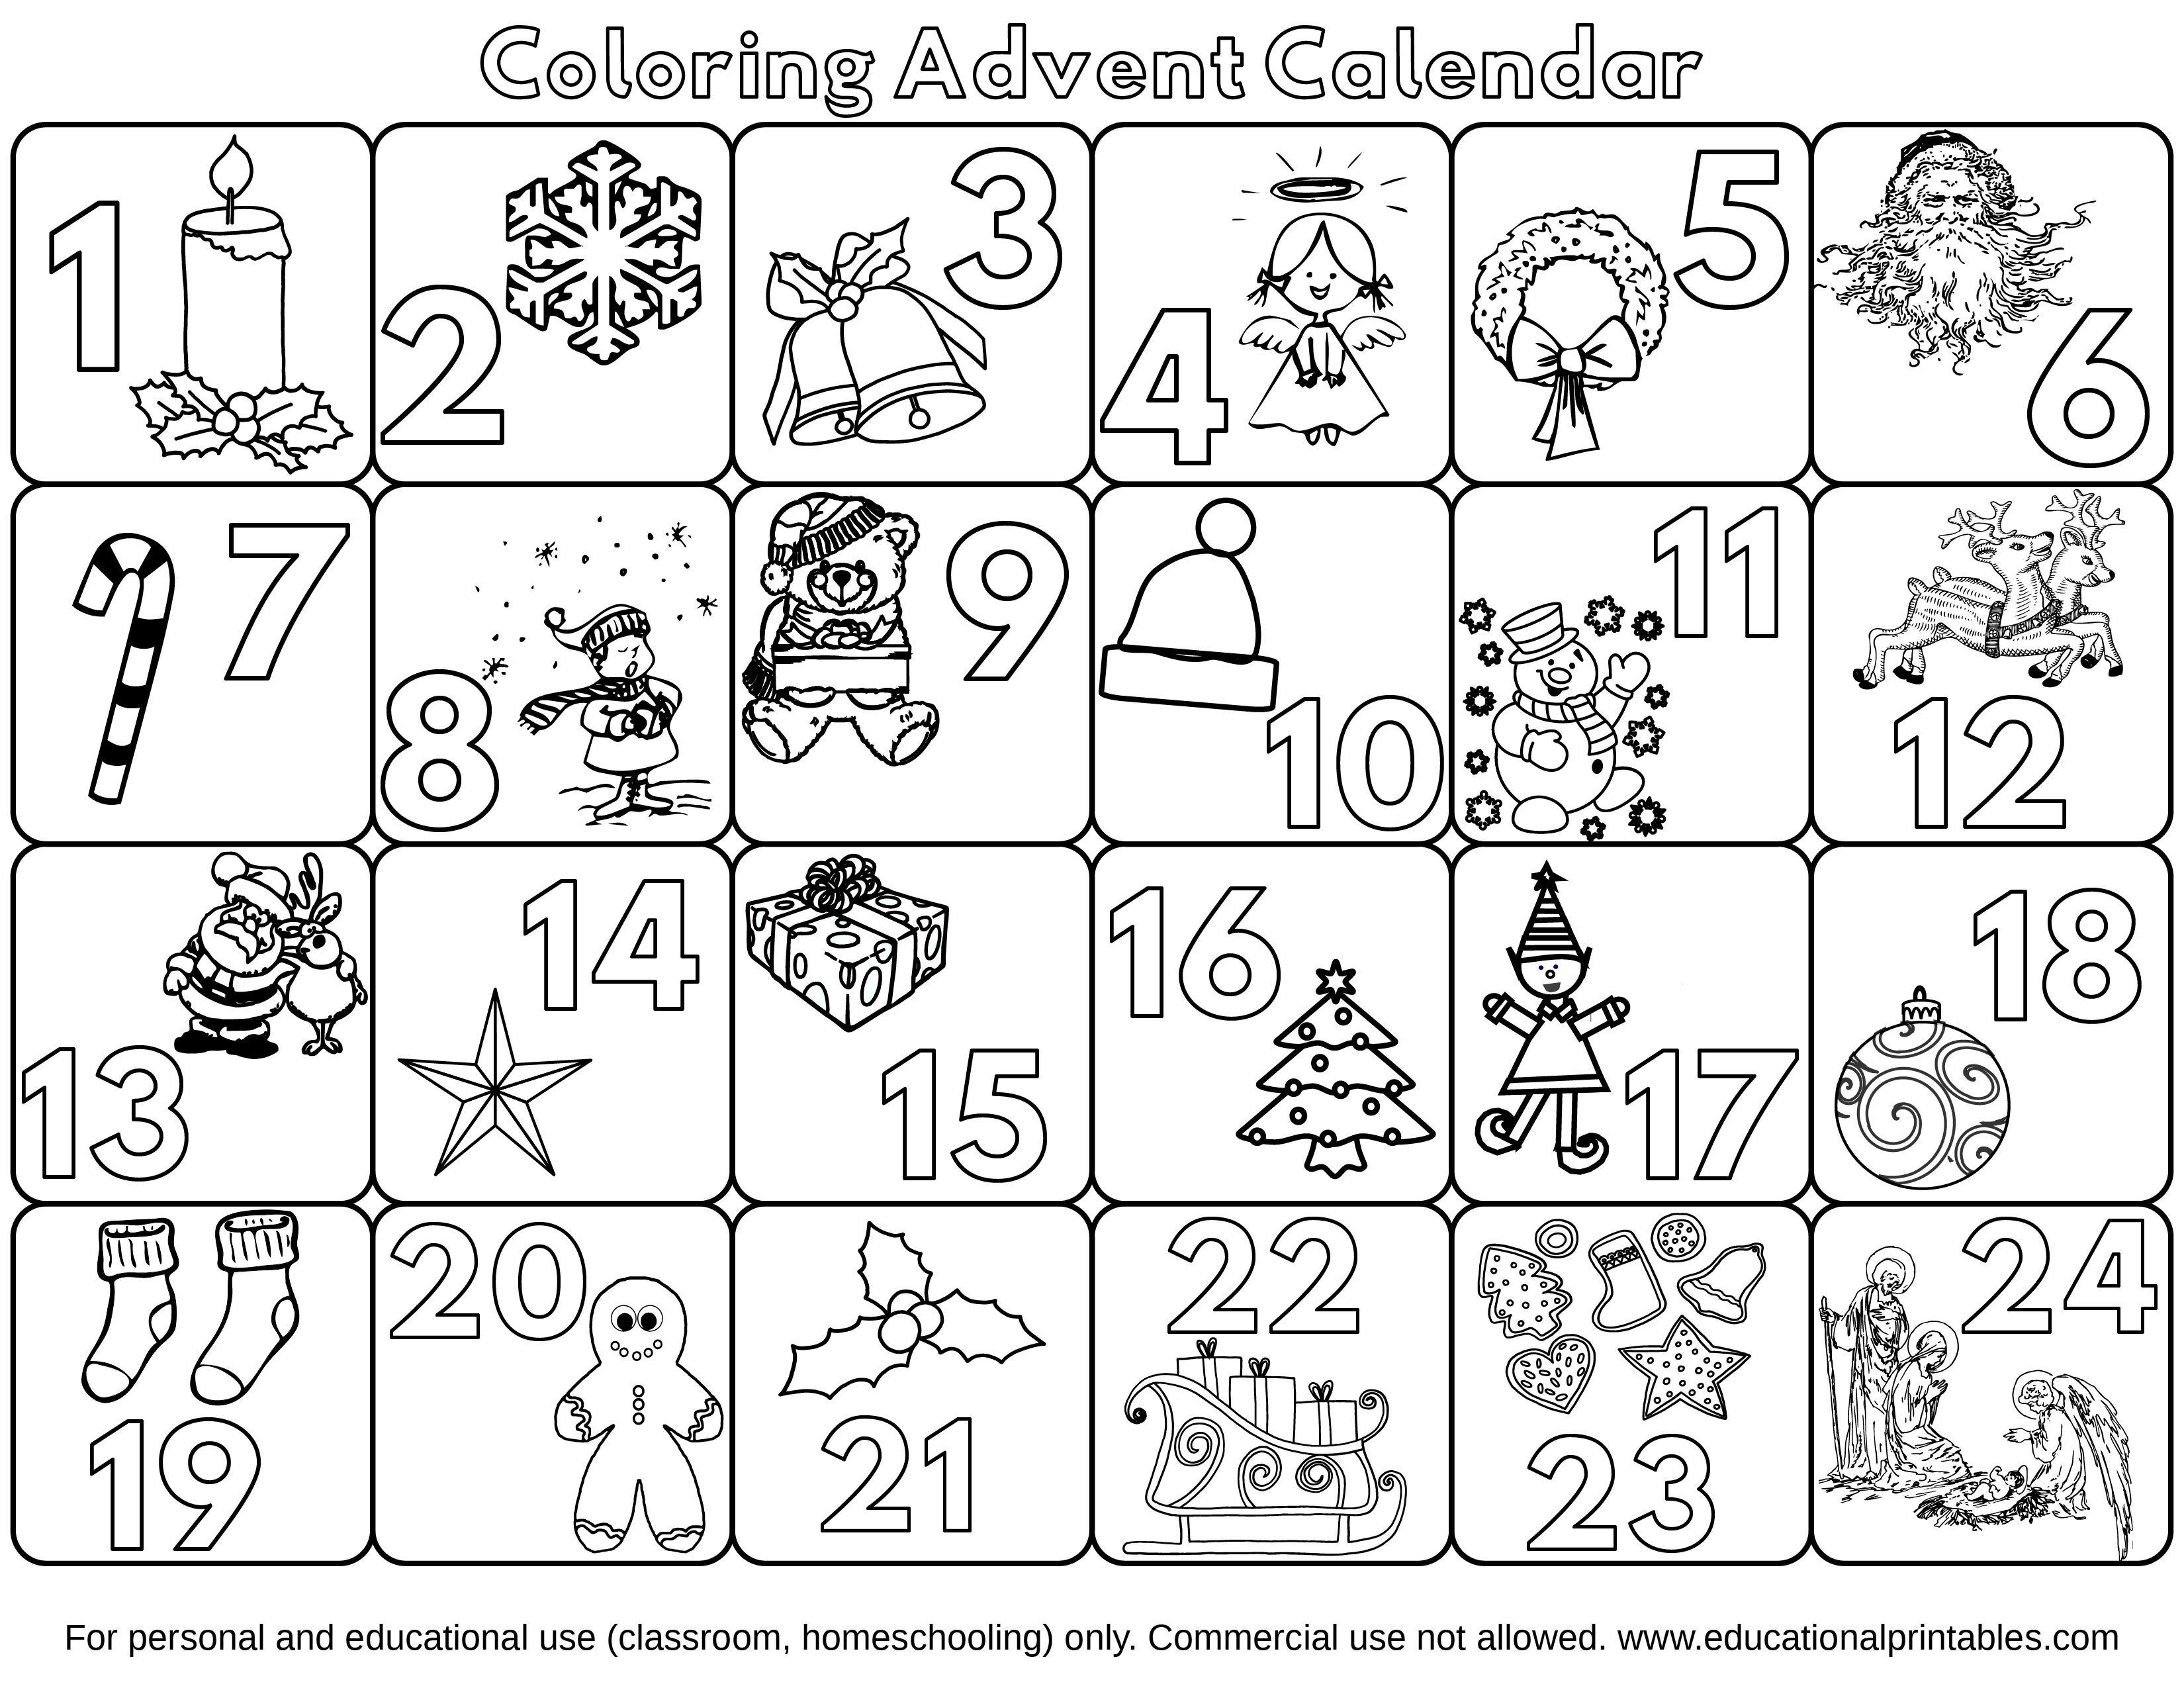 Free Coloring Advent Calendar